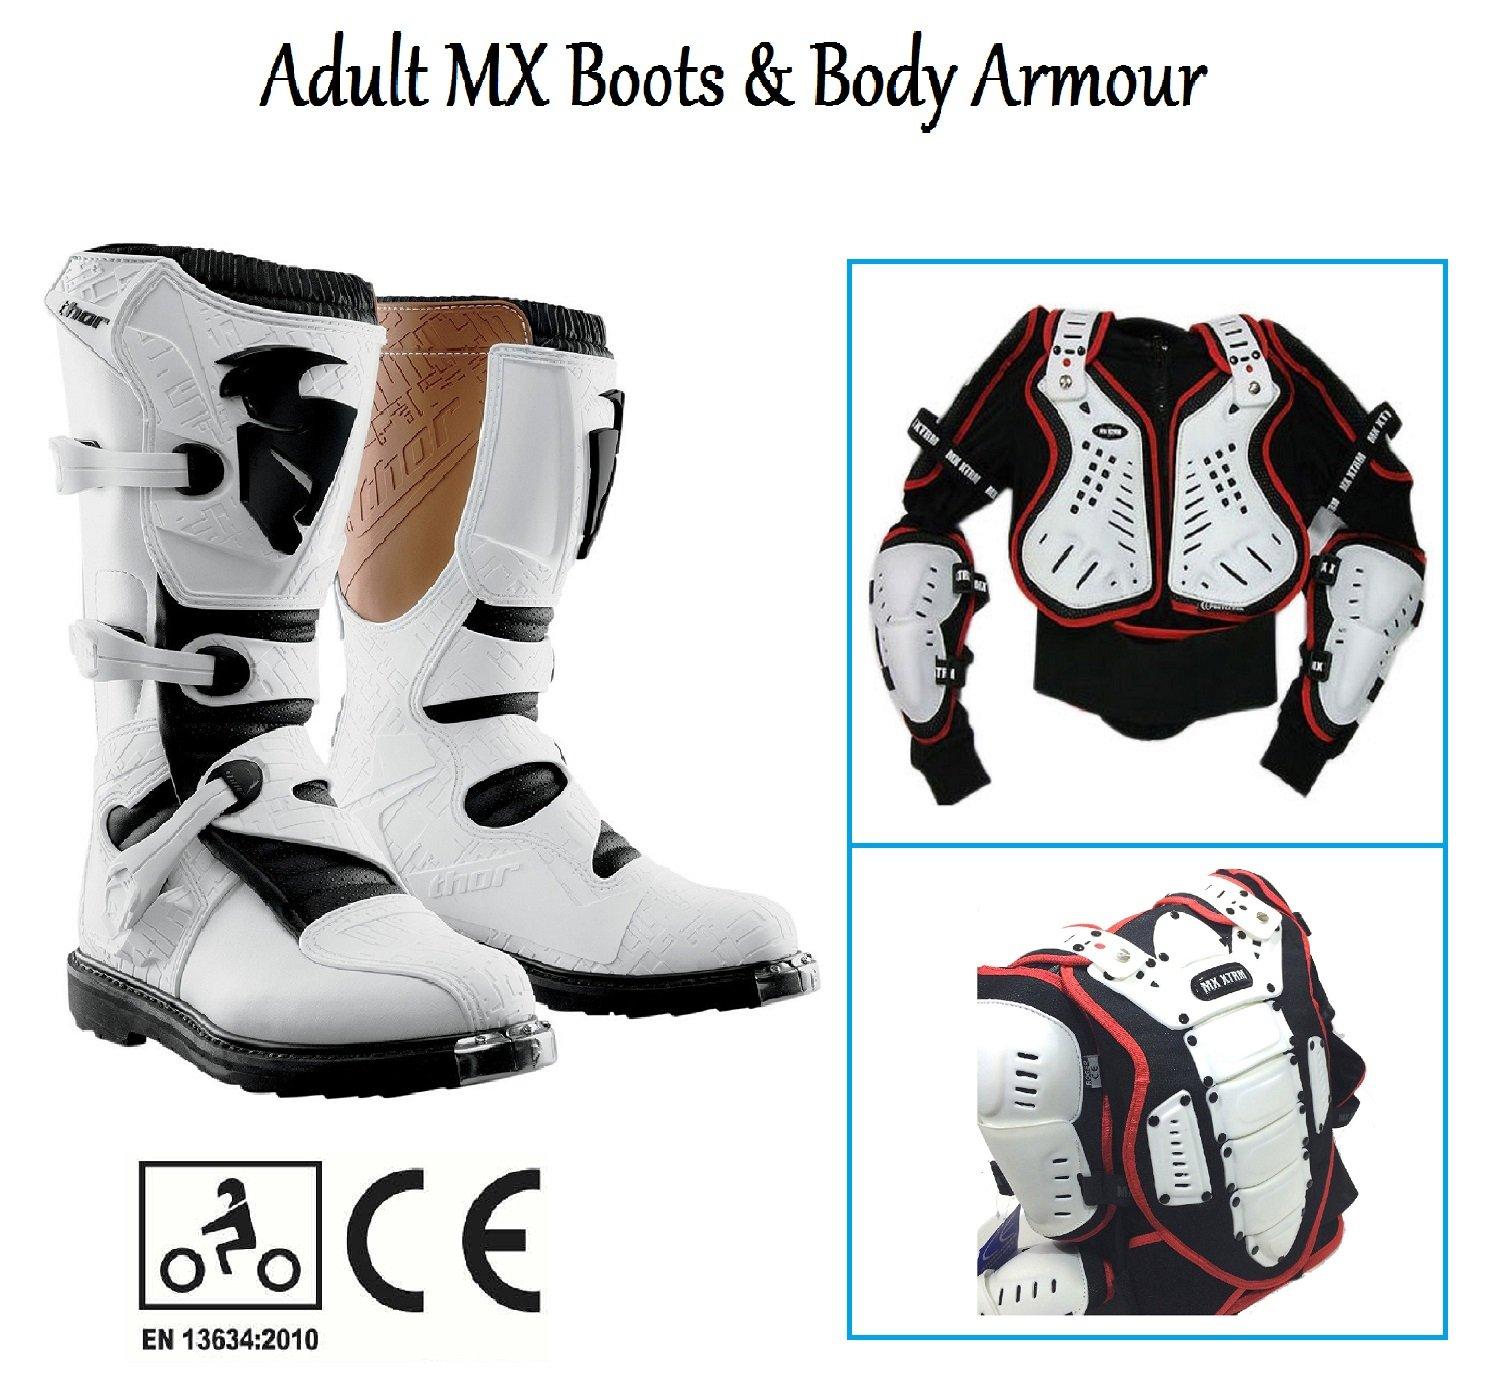 UK 7//EU 41 TRACK TECH RST EVO CE 2101 Motorcycle Black Boots Enduro MX Quad Trail Bike ATV MTB Safety Shoes